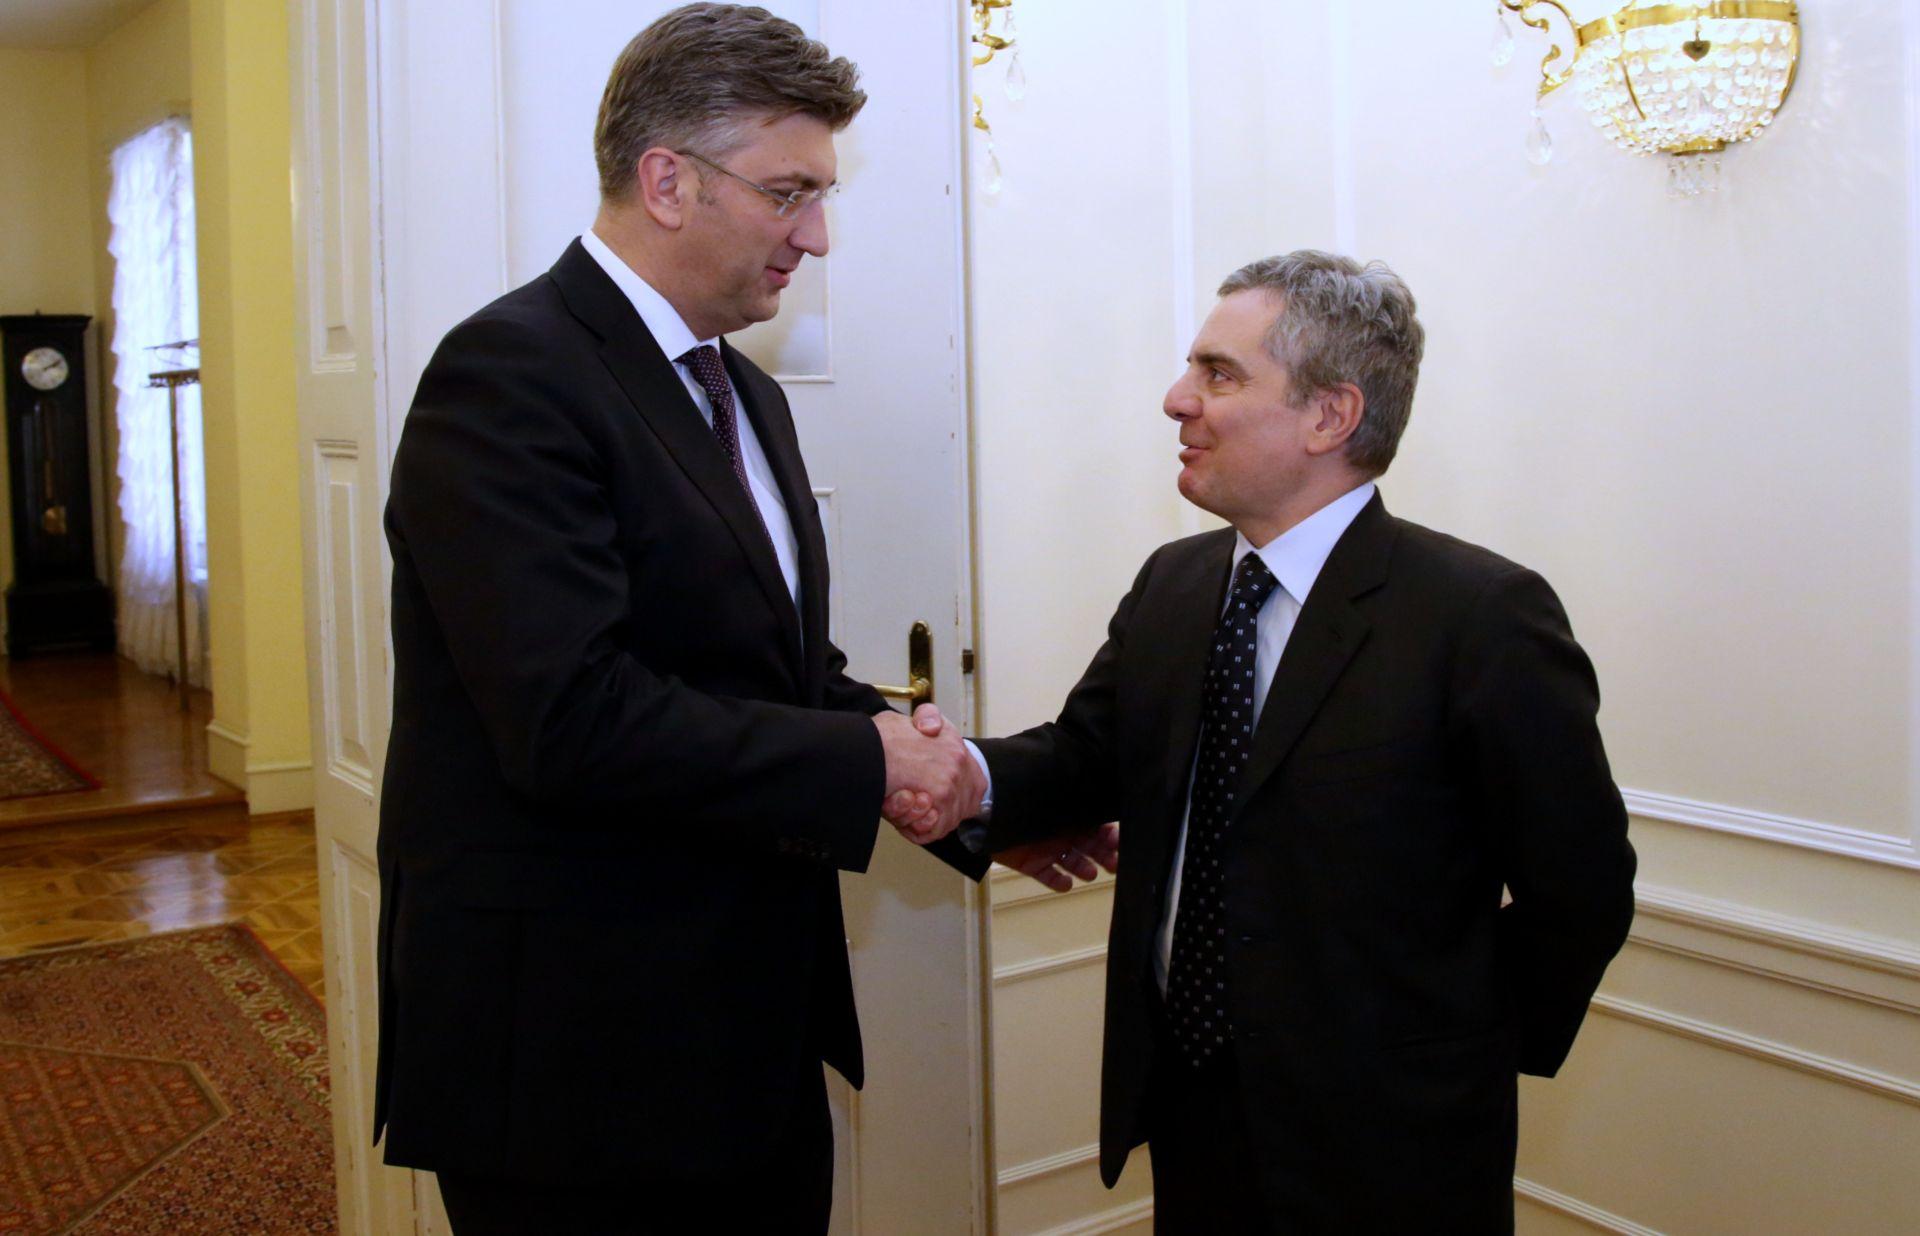 BANSKI DVORI: Plenković s potpredsjednikom EIB-a Scannapiecom